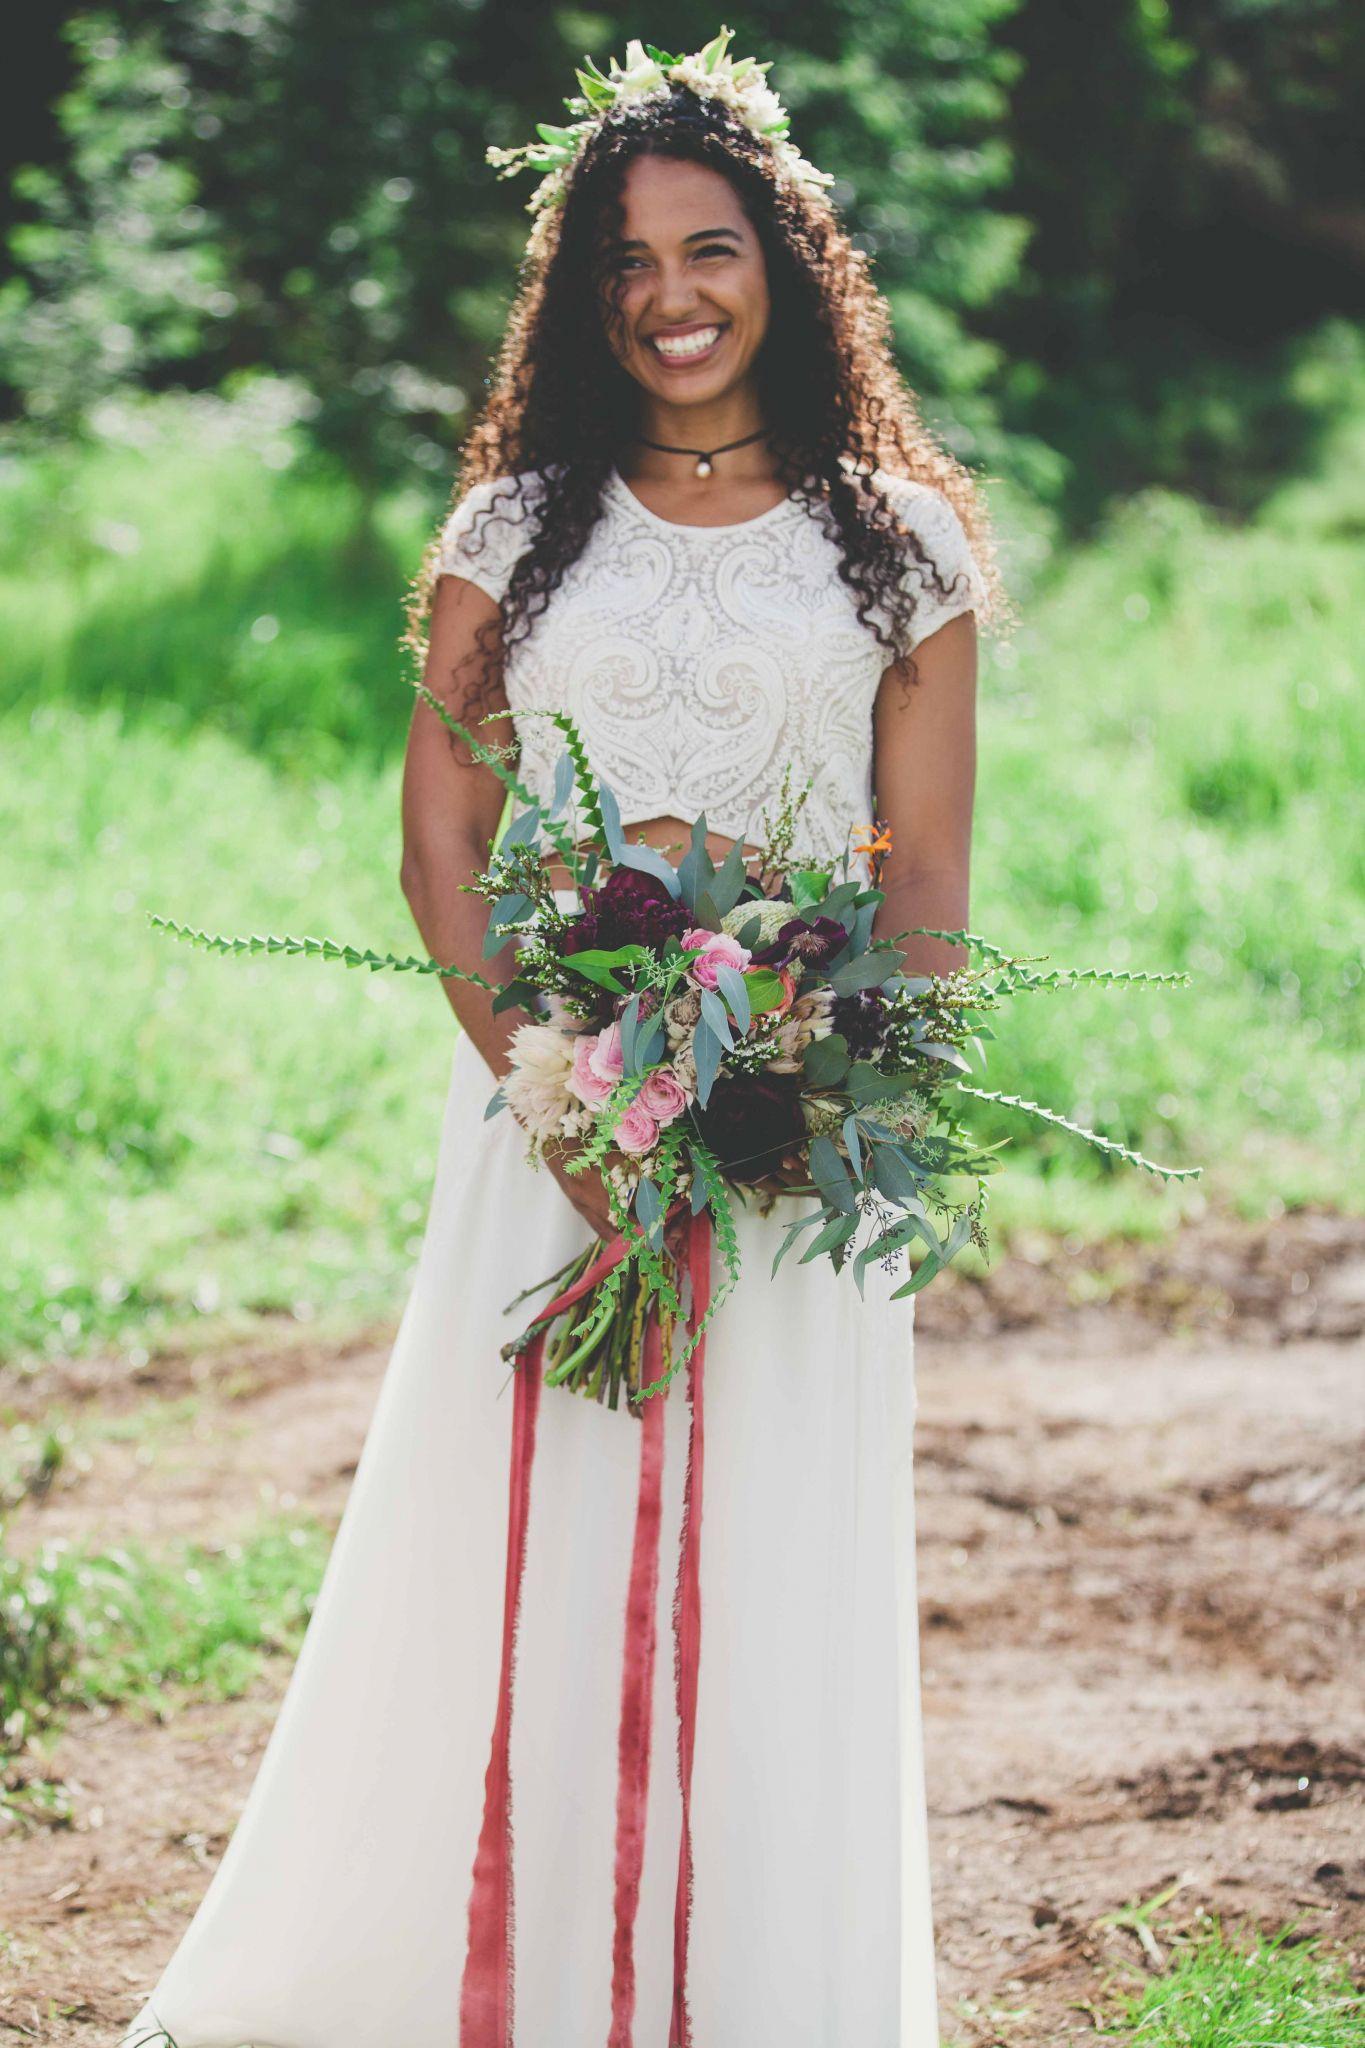 Traditional Hawaiian Wedding Dresses - Wedding Dresses for the ...